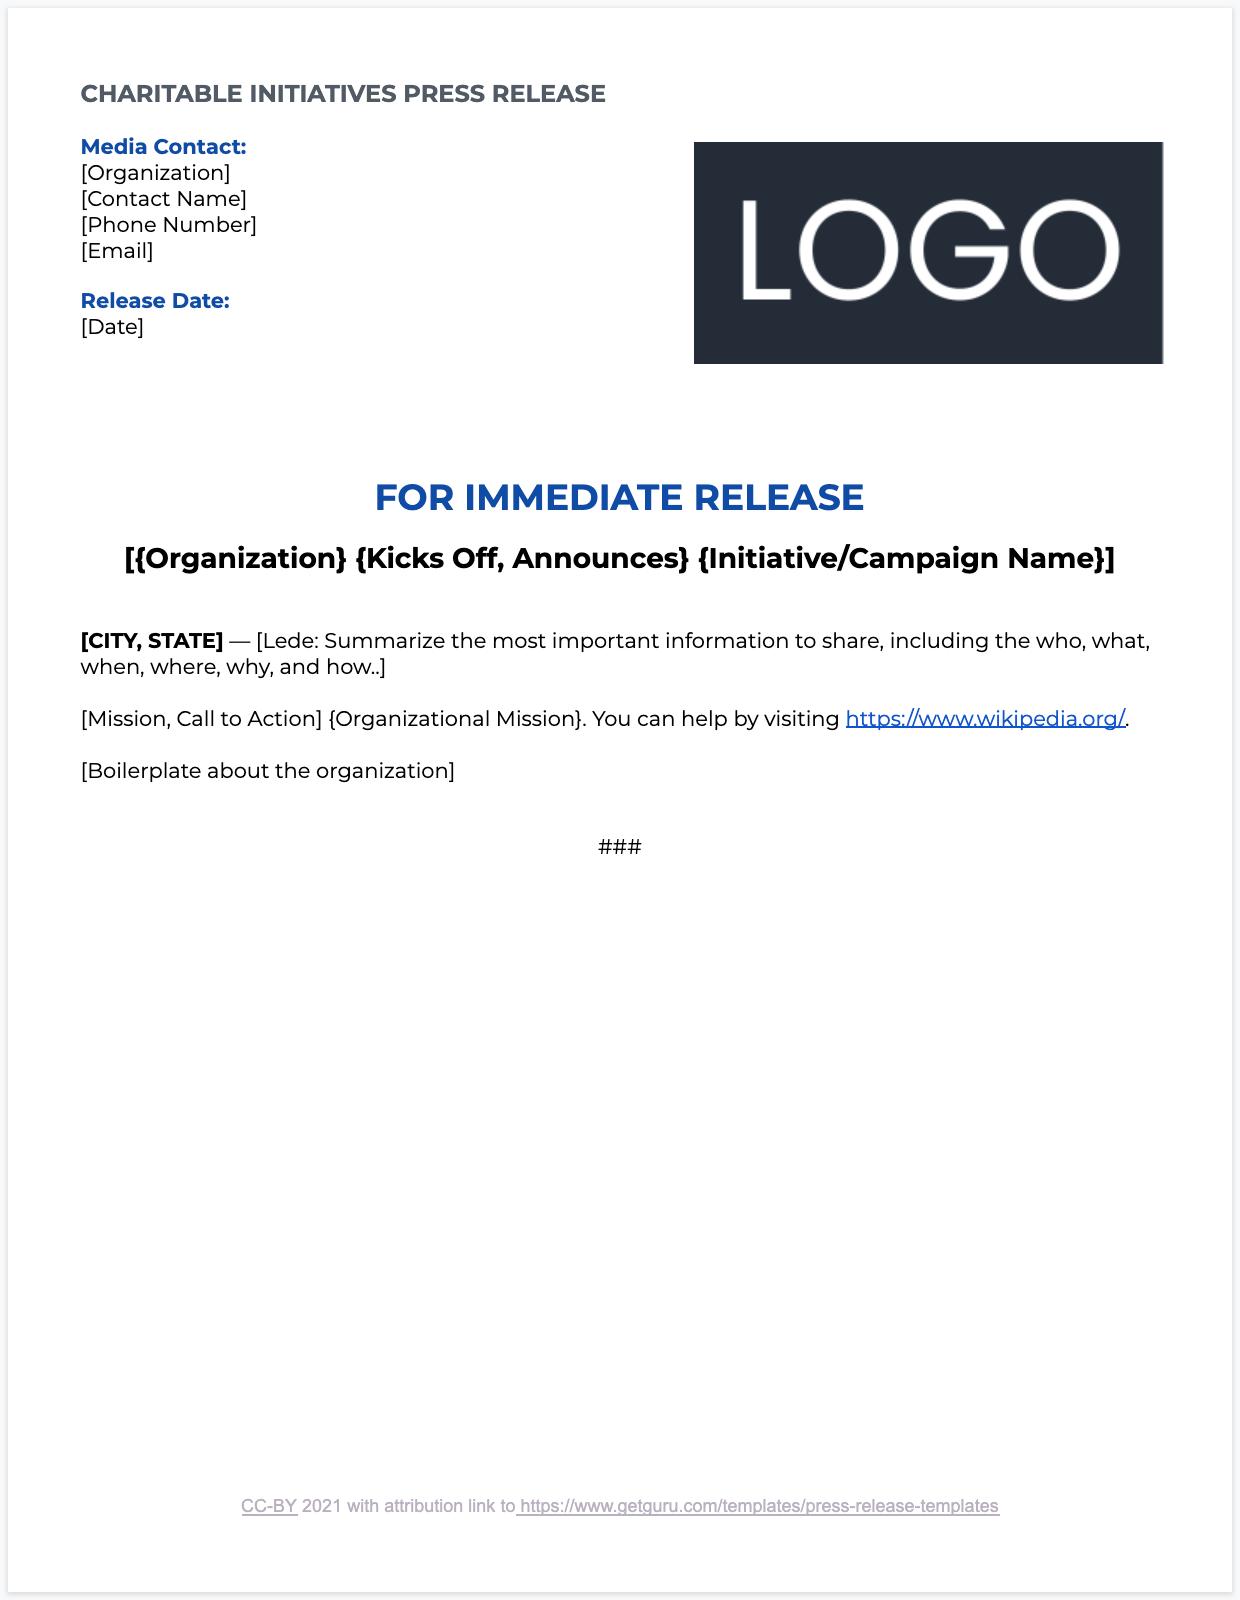 Charitable Initiative Press Release Template